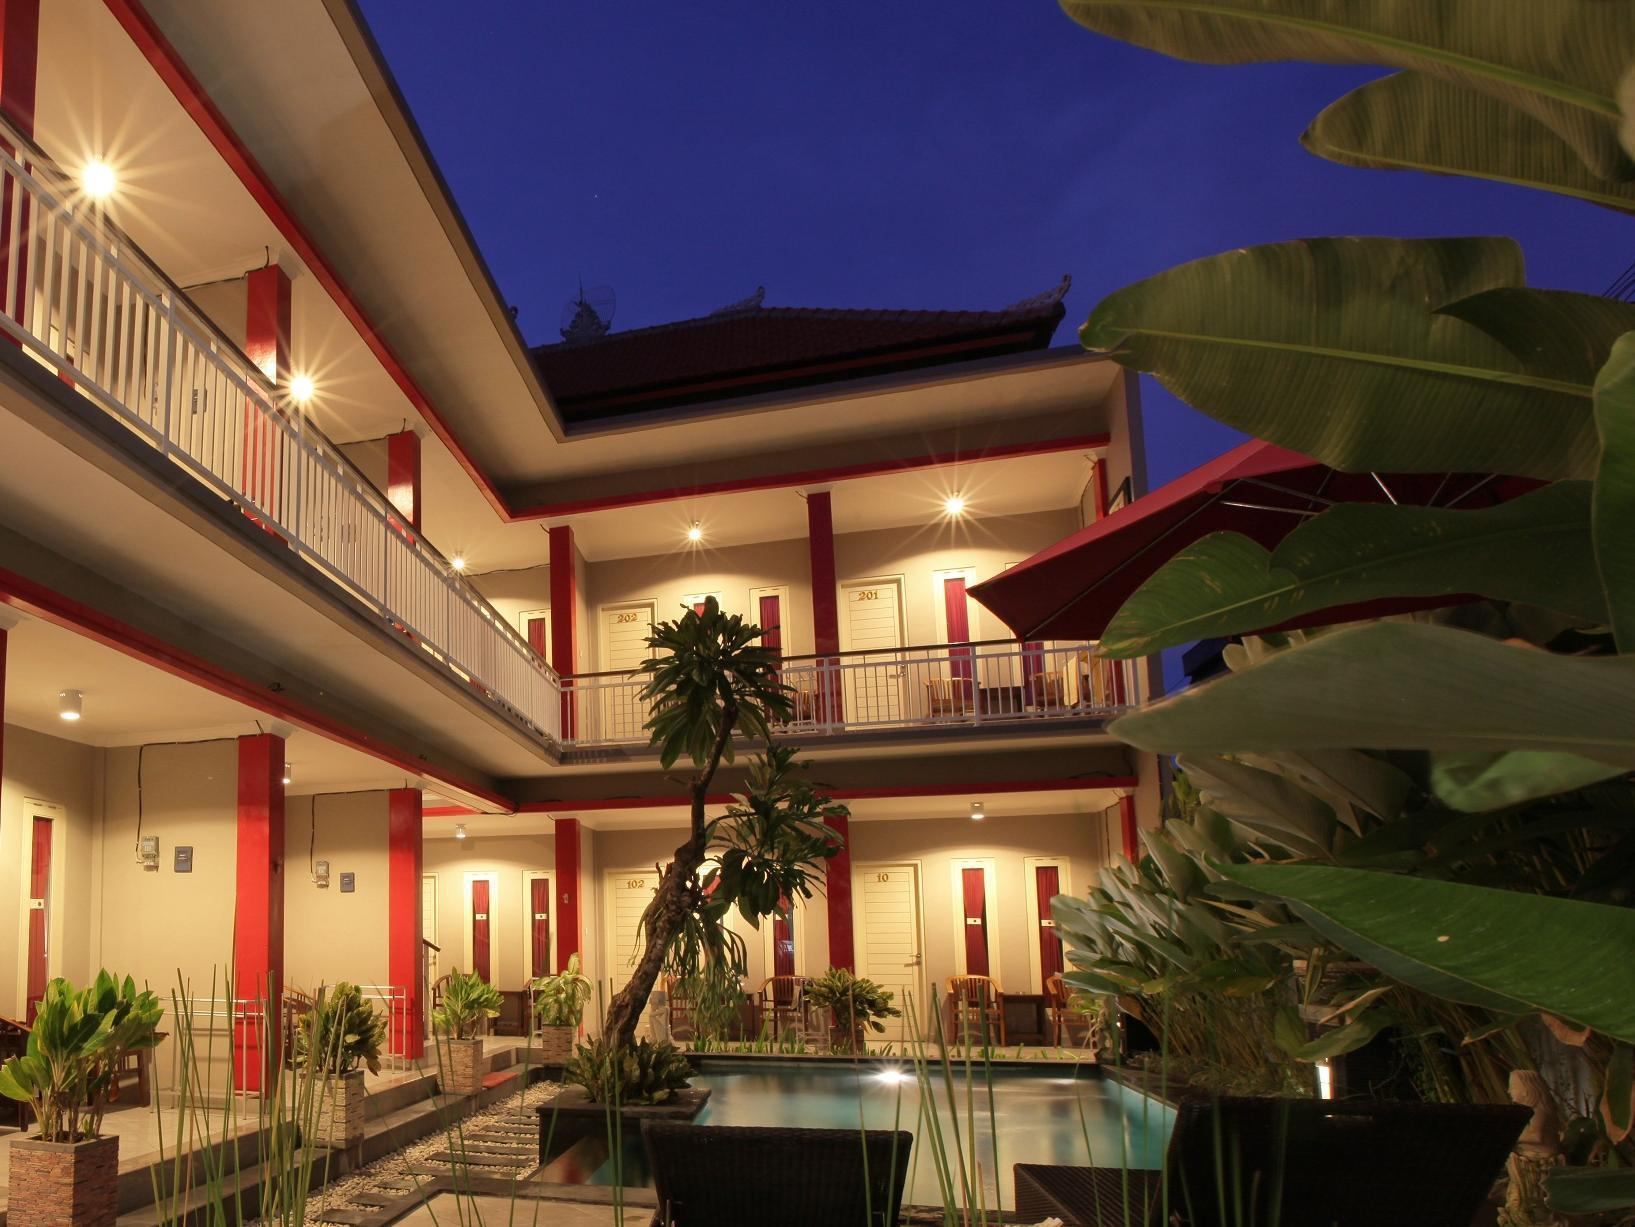 Rabasta Angkul Angkul Beach Inn Kuta